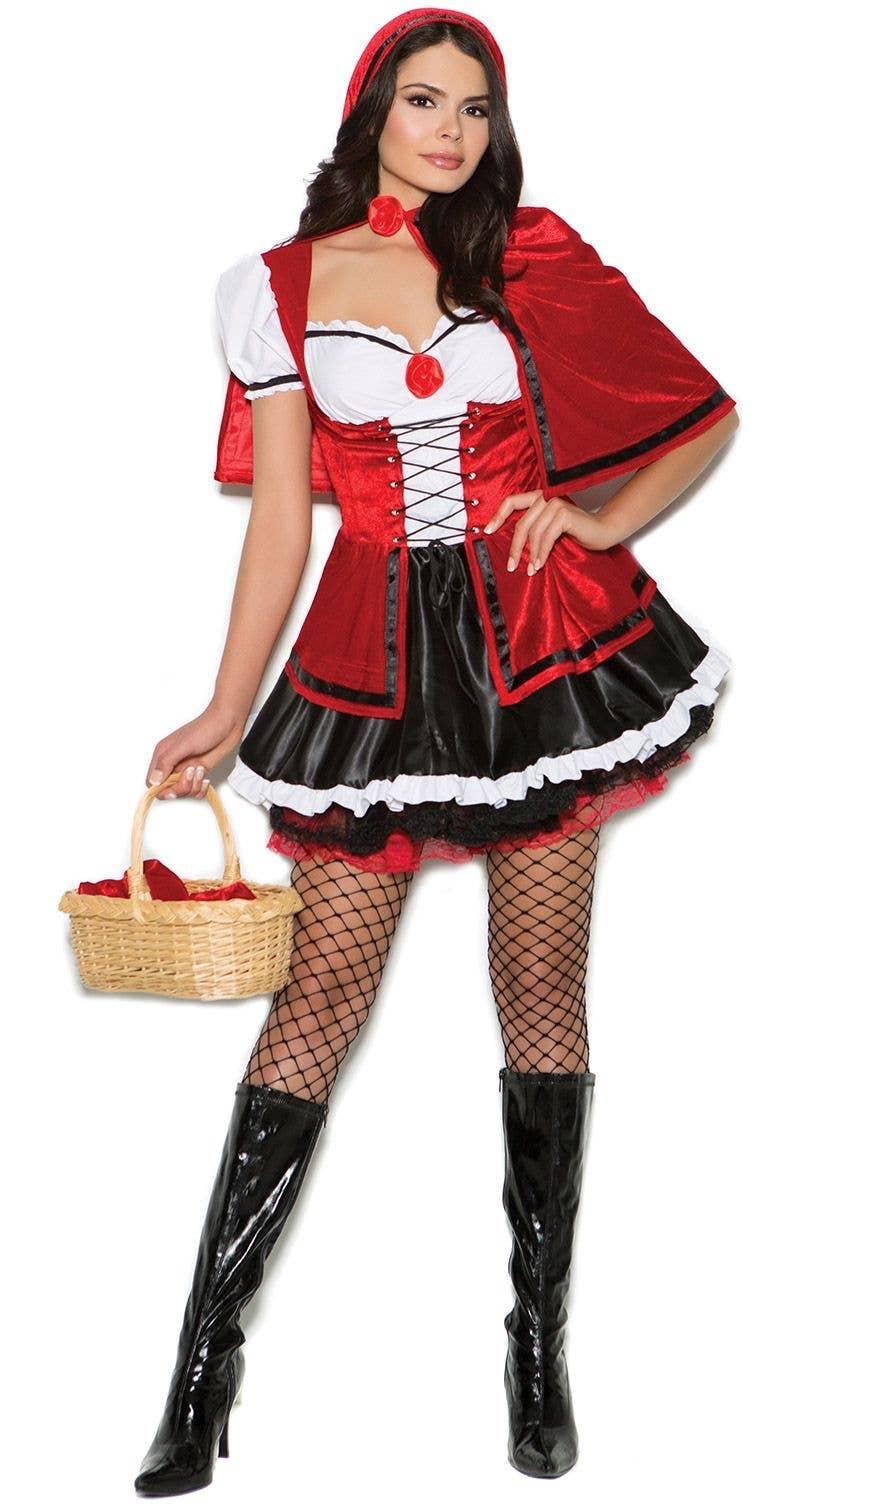 Wolf Head In Basket Red Riding Hood Halloween Fancy Dress Costume Prop